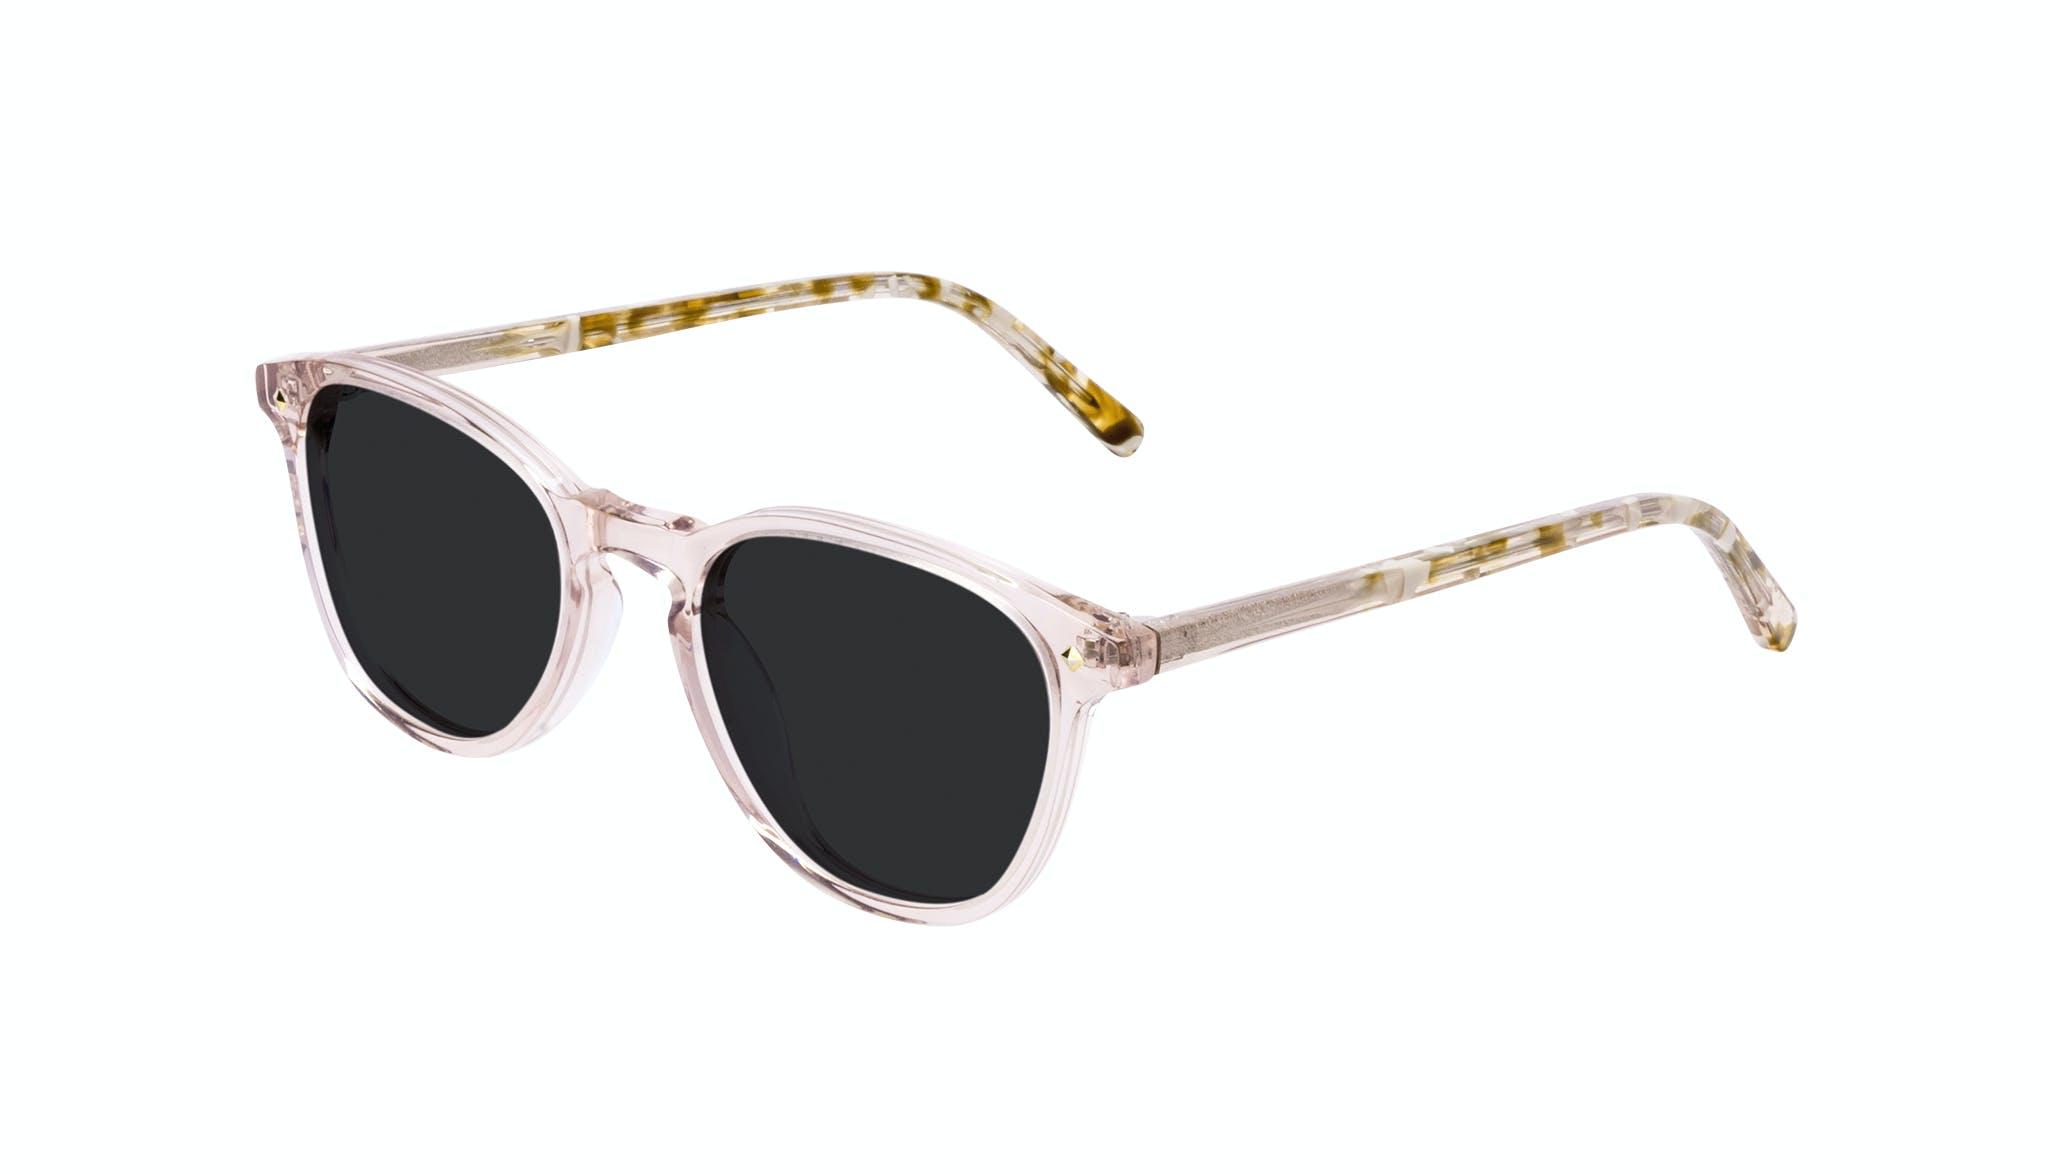 Affordable Fashion Glasses Round Sunglasses Women Crush Rose Tilt